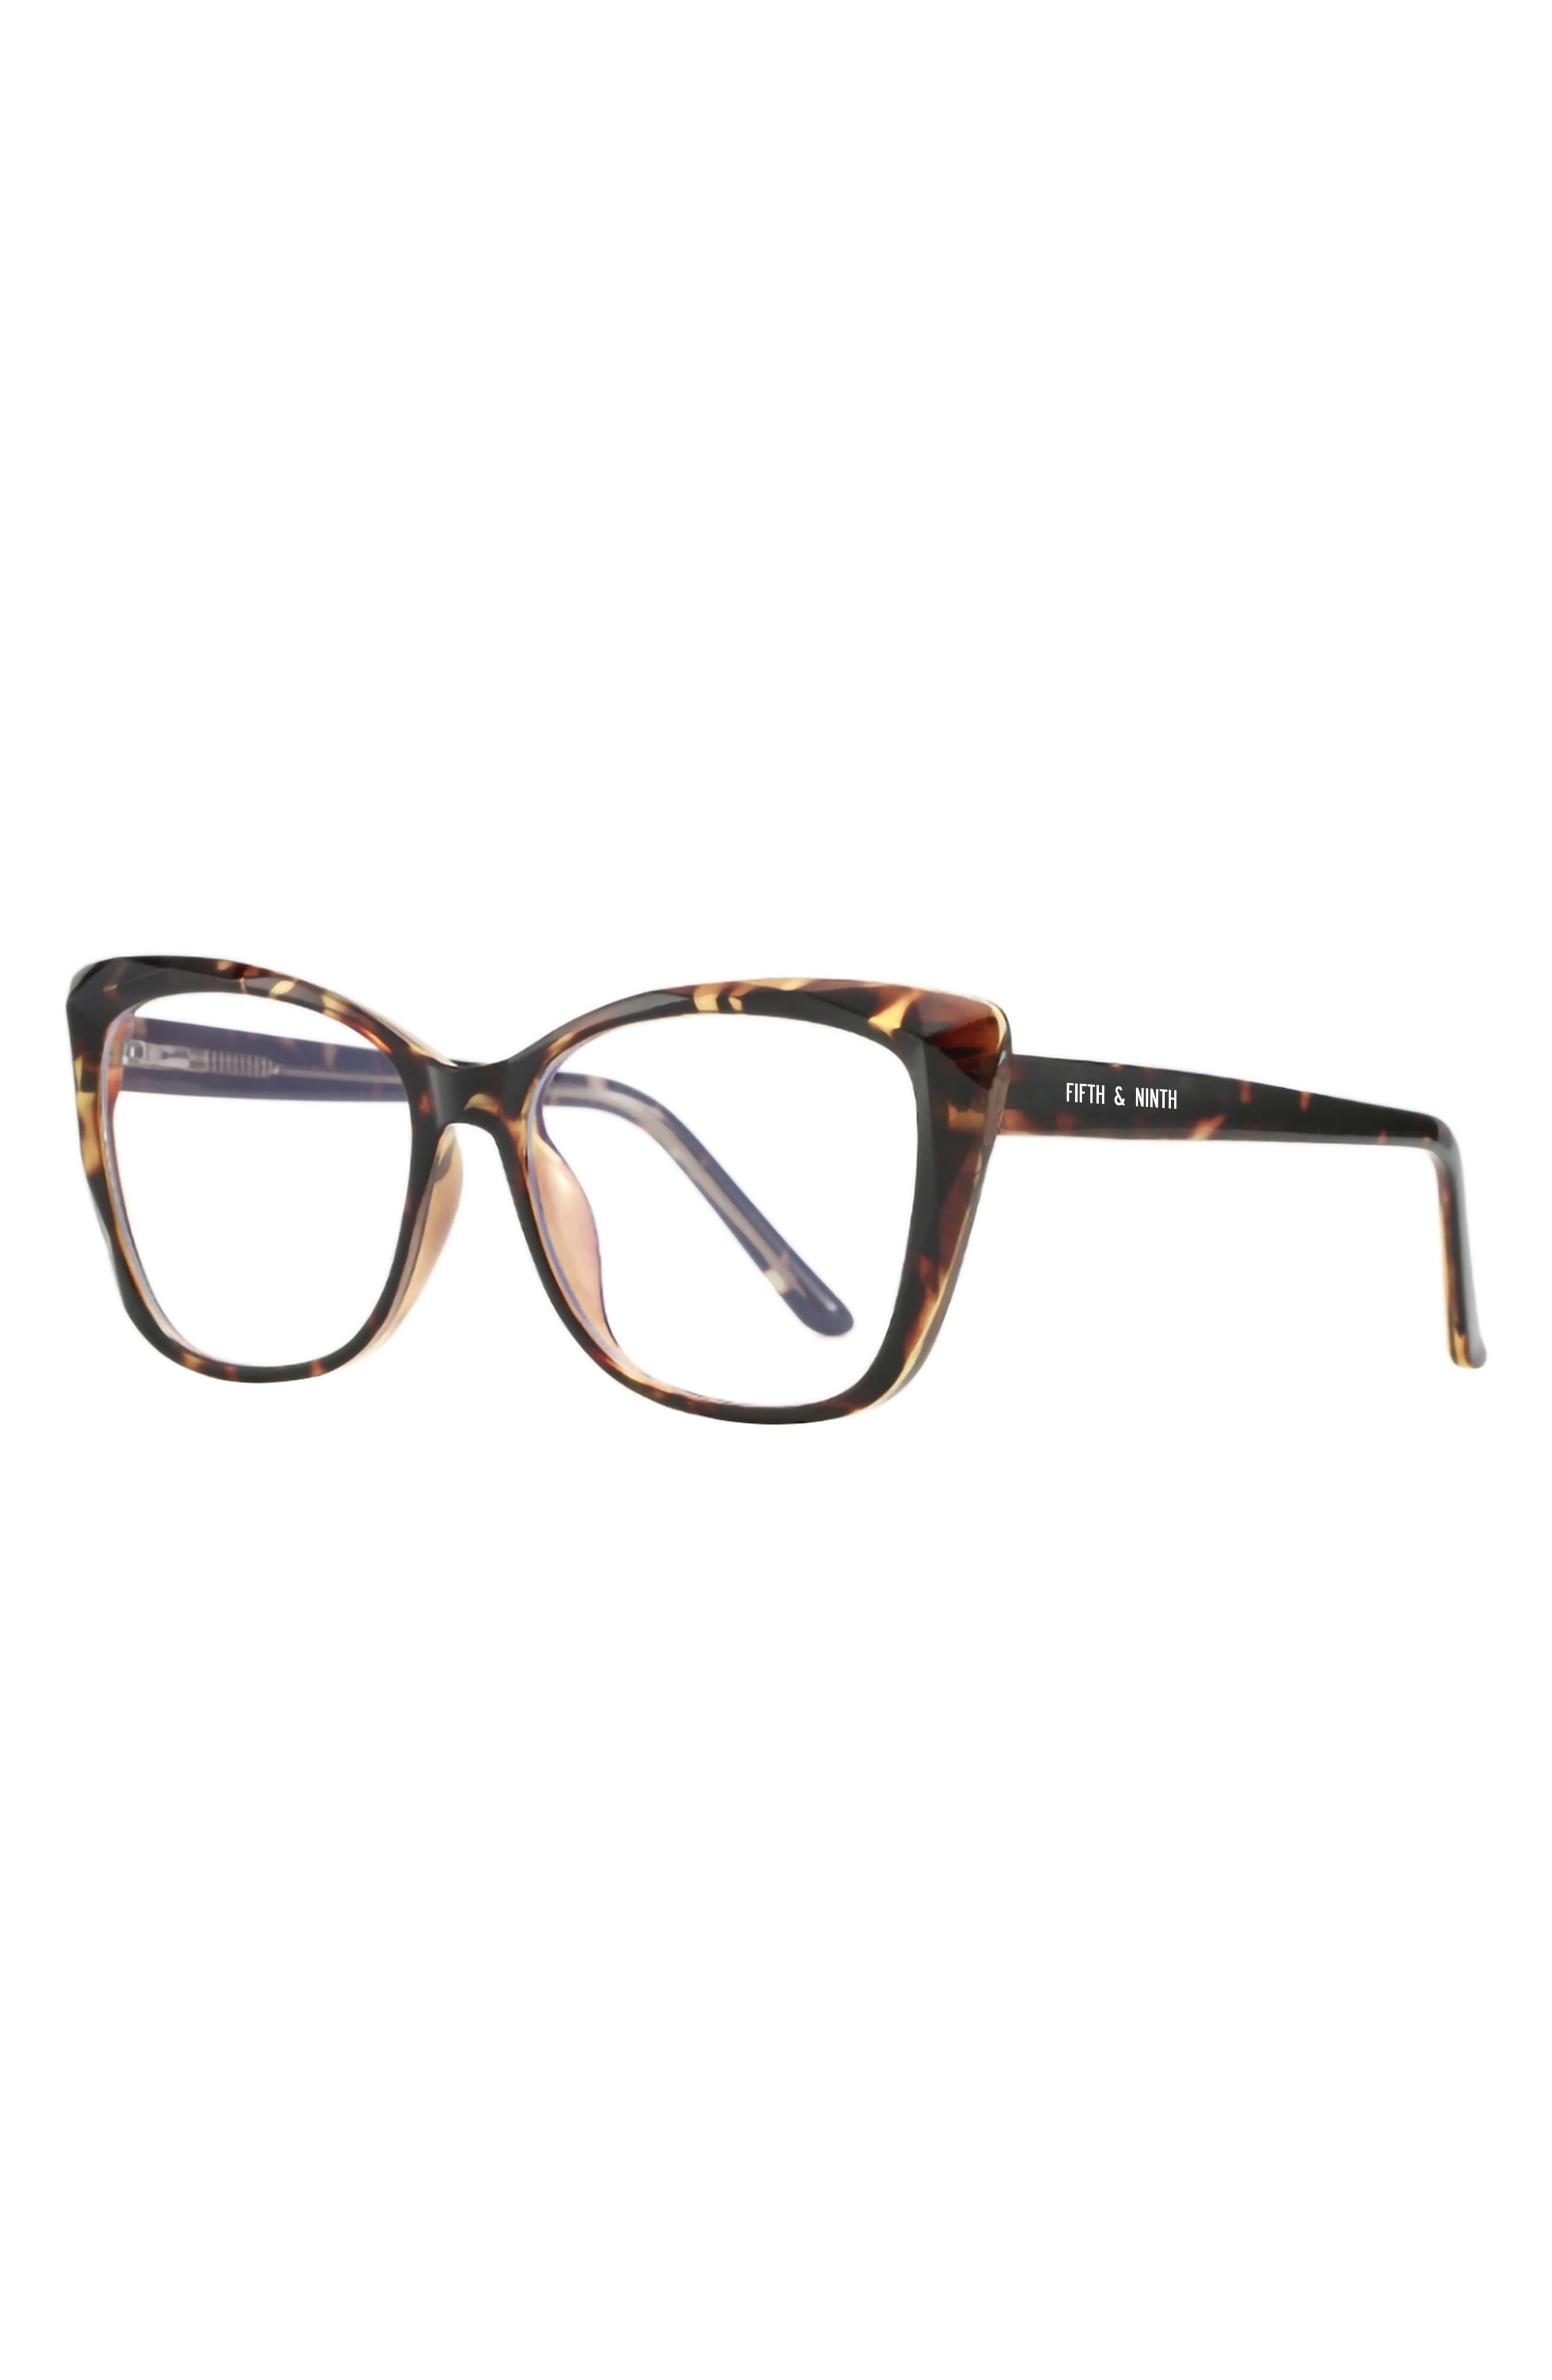 Madison 50mm Blue Light Filtering Glasses